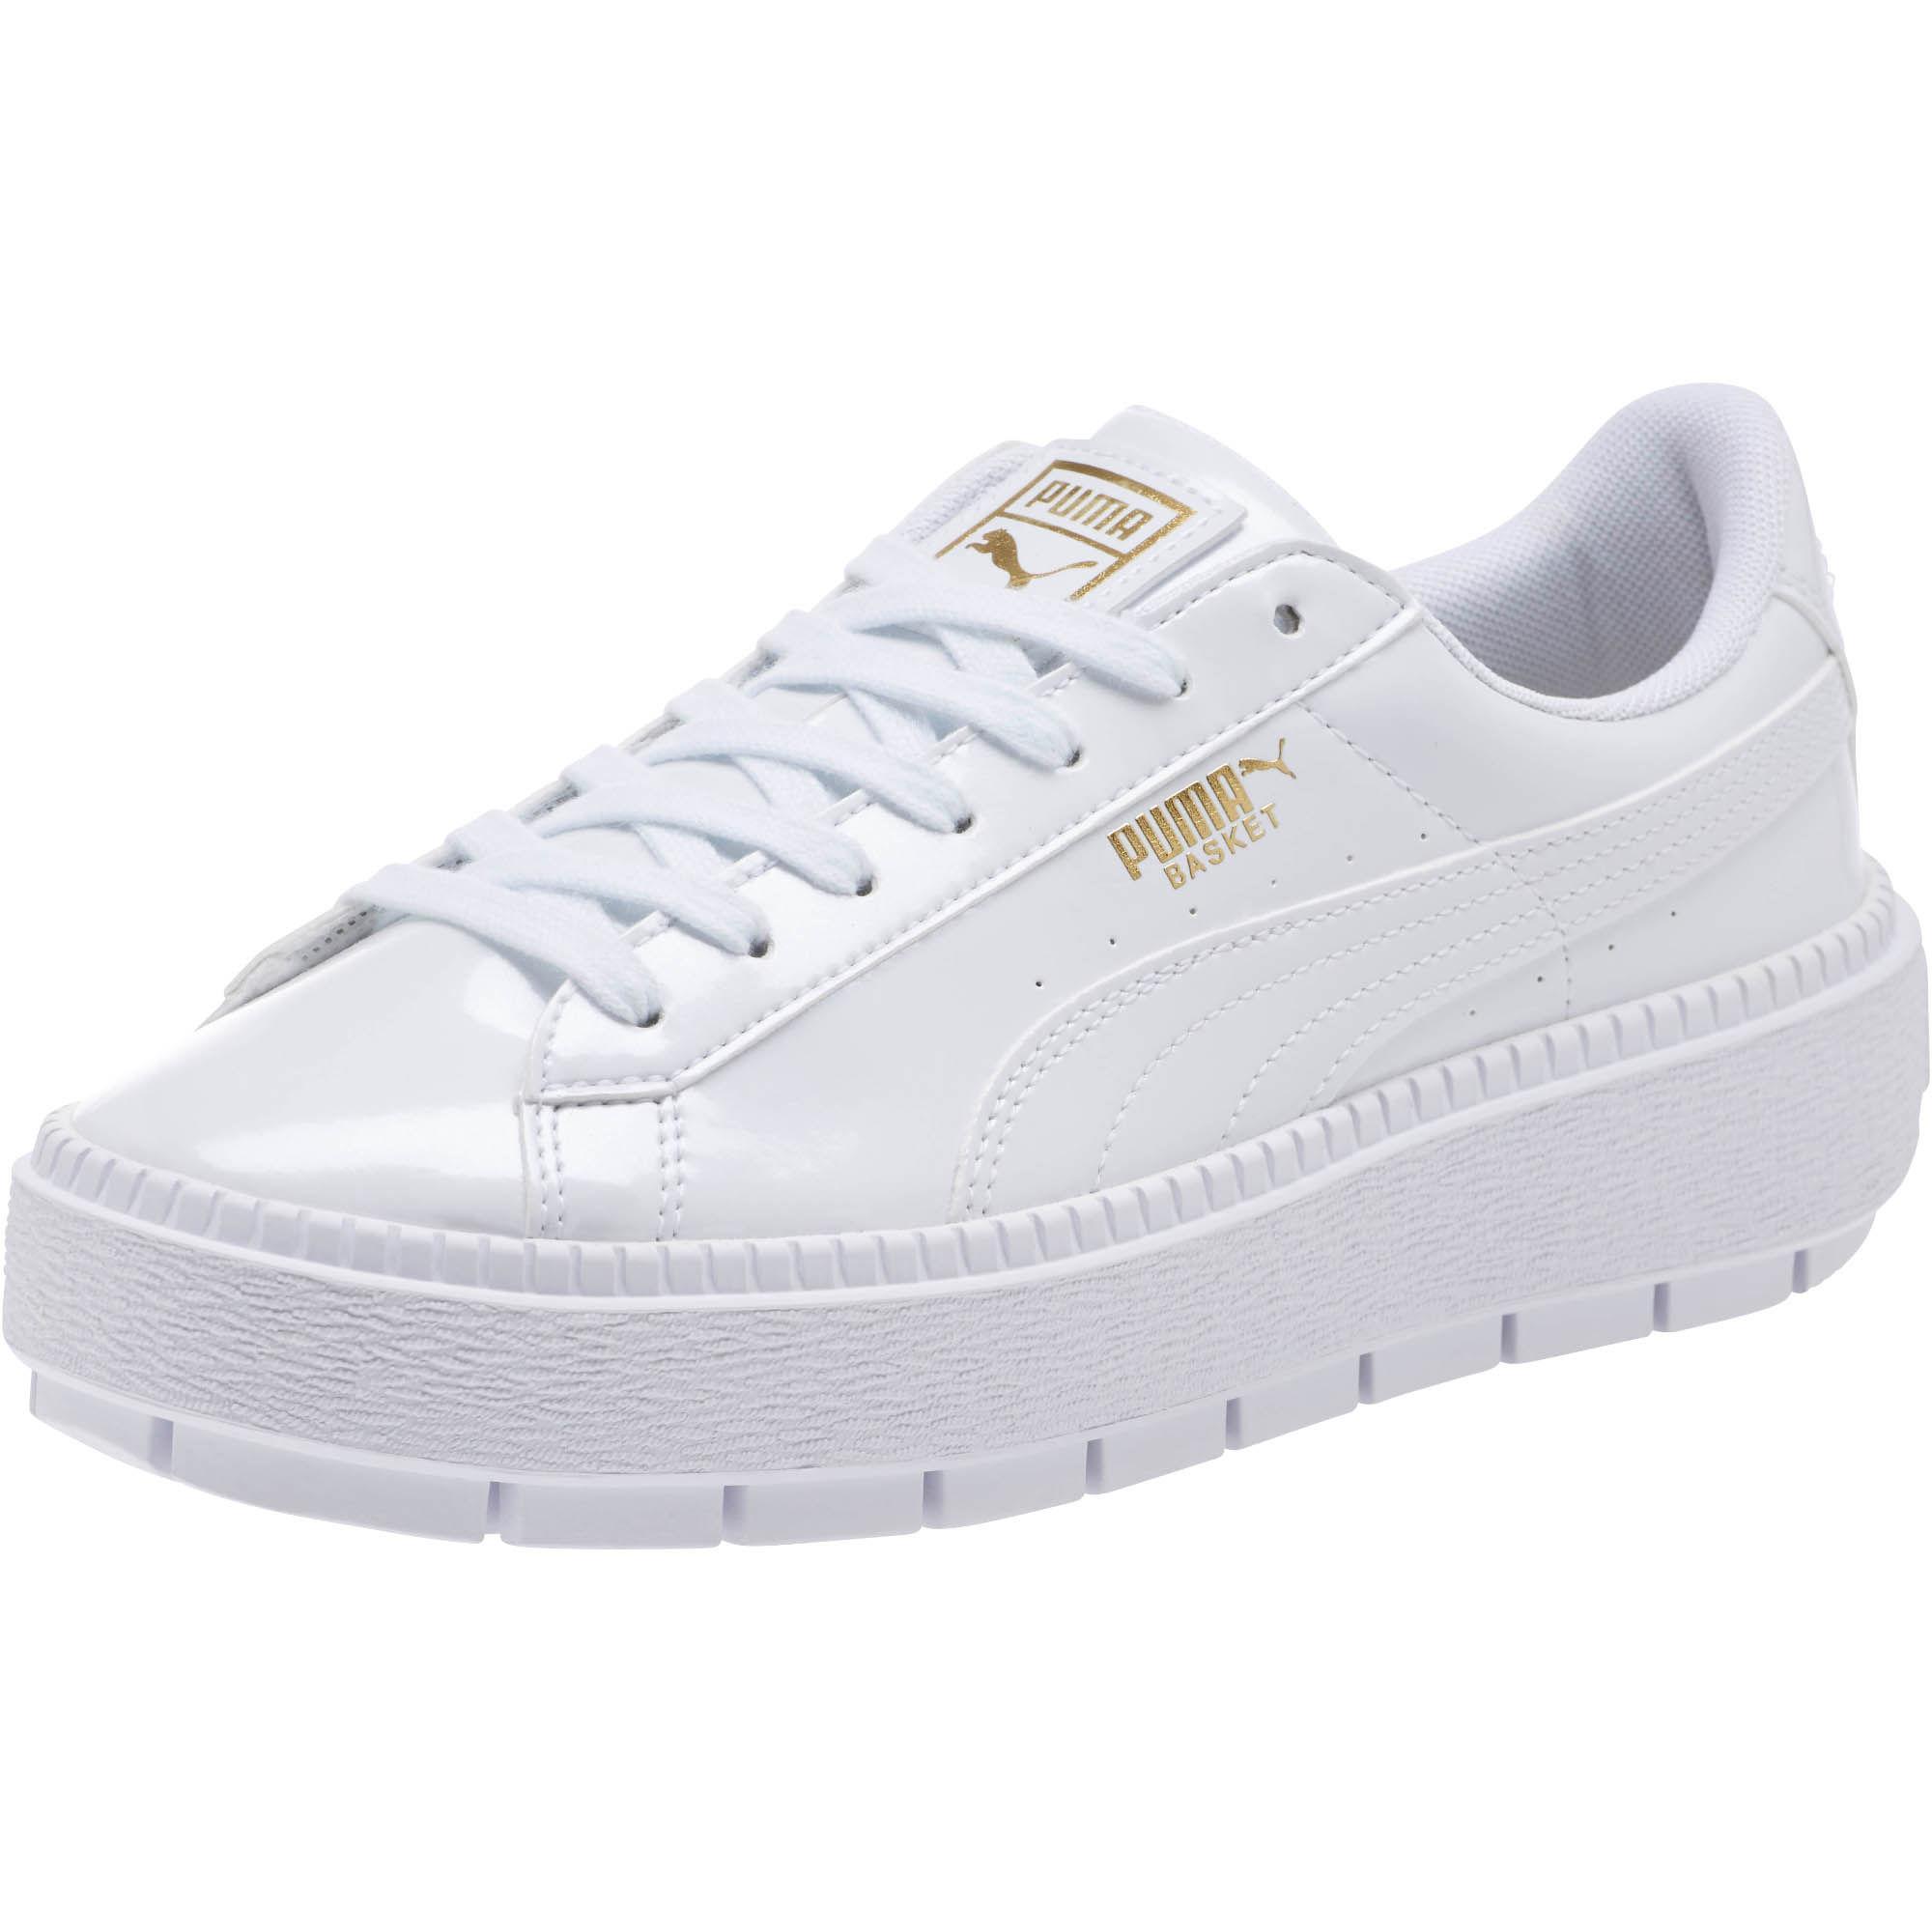 7b34fc804f5374 Lyst - PUMA Basket Platform Trace P Women s Sneakers in White